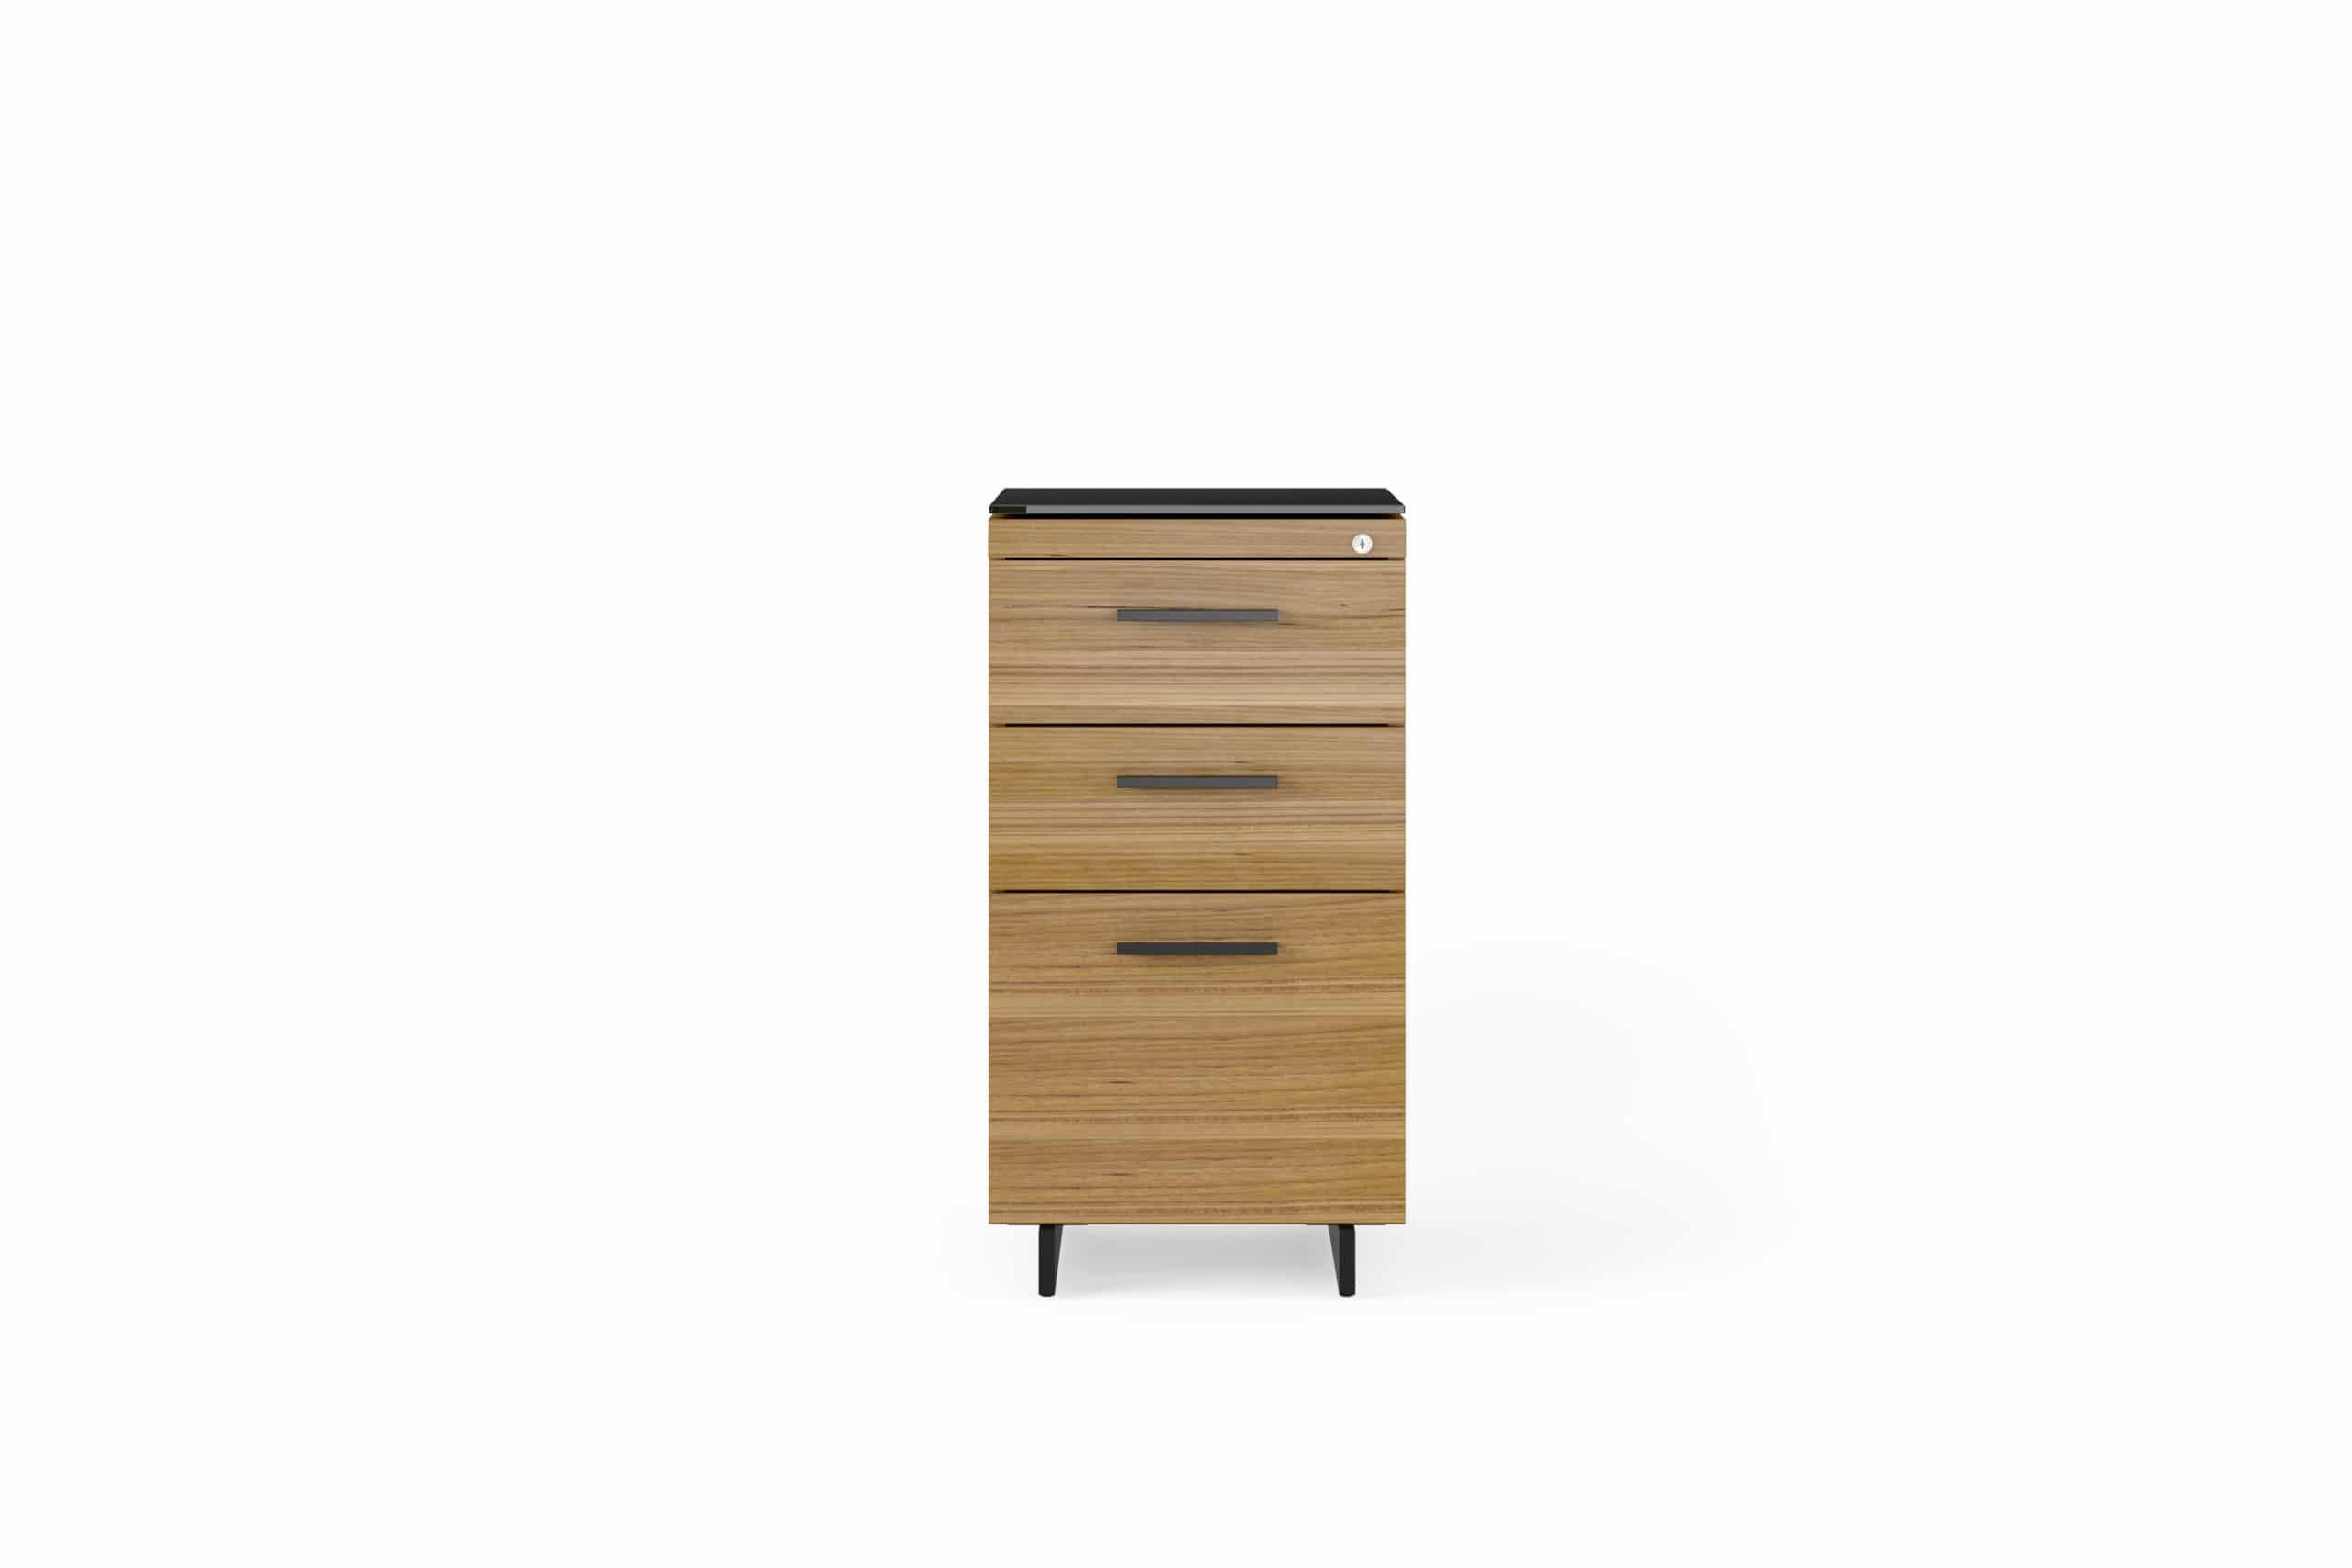 Sequel 6114 3 Drawer File & Storage Cabinet | BDI Furniture